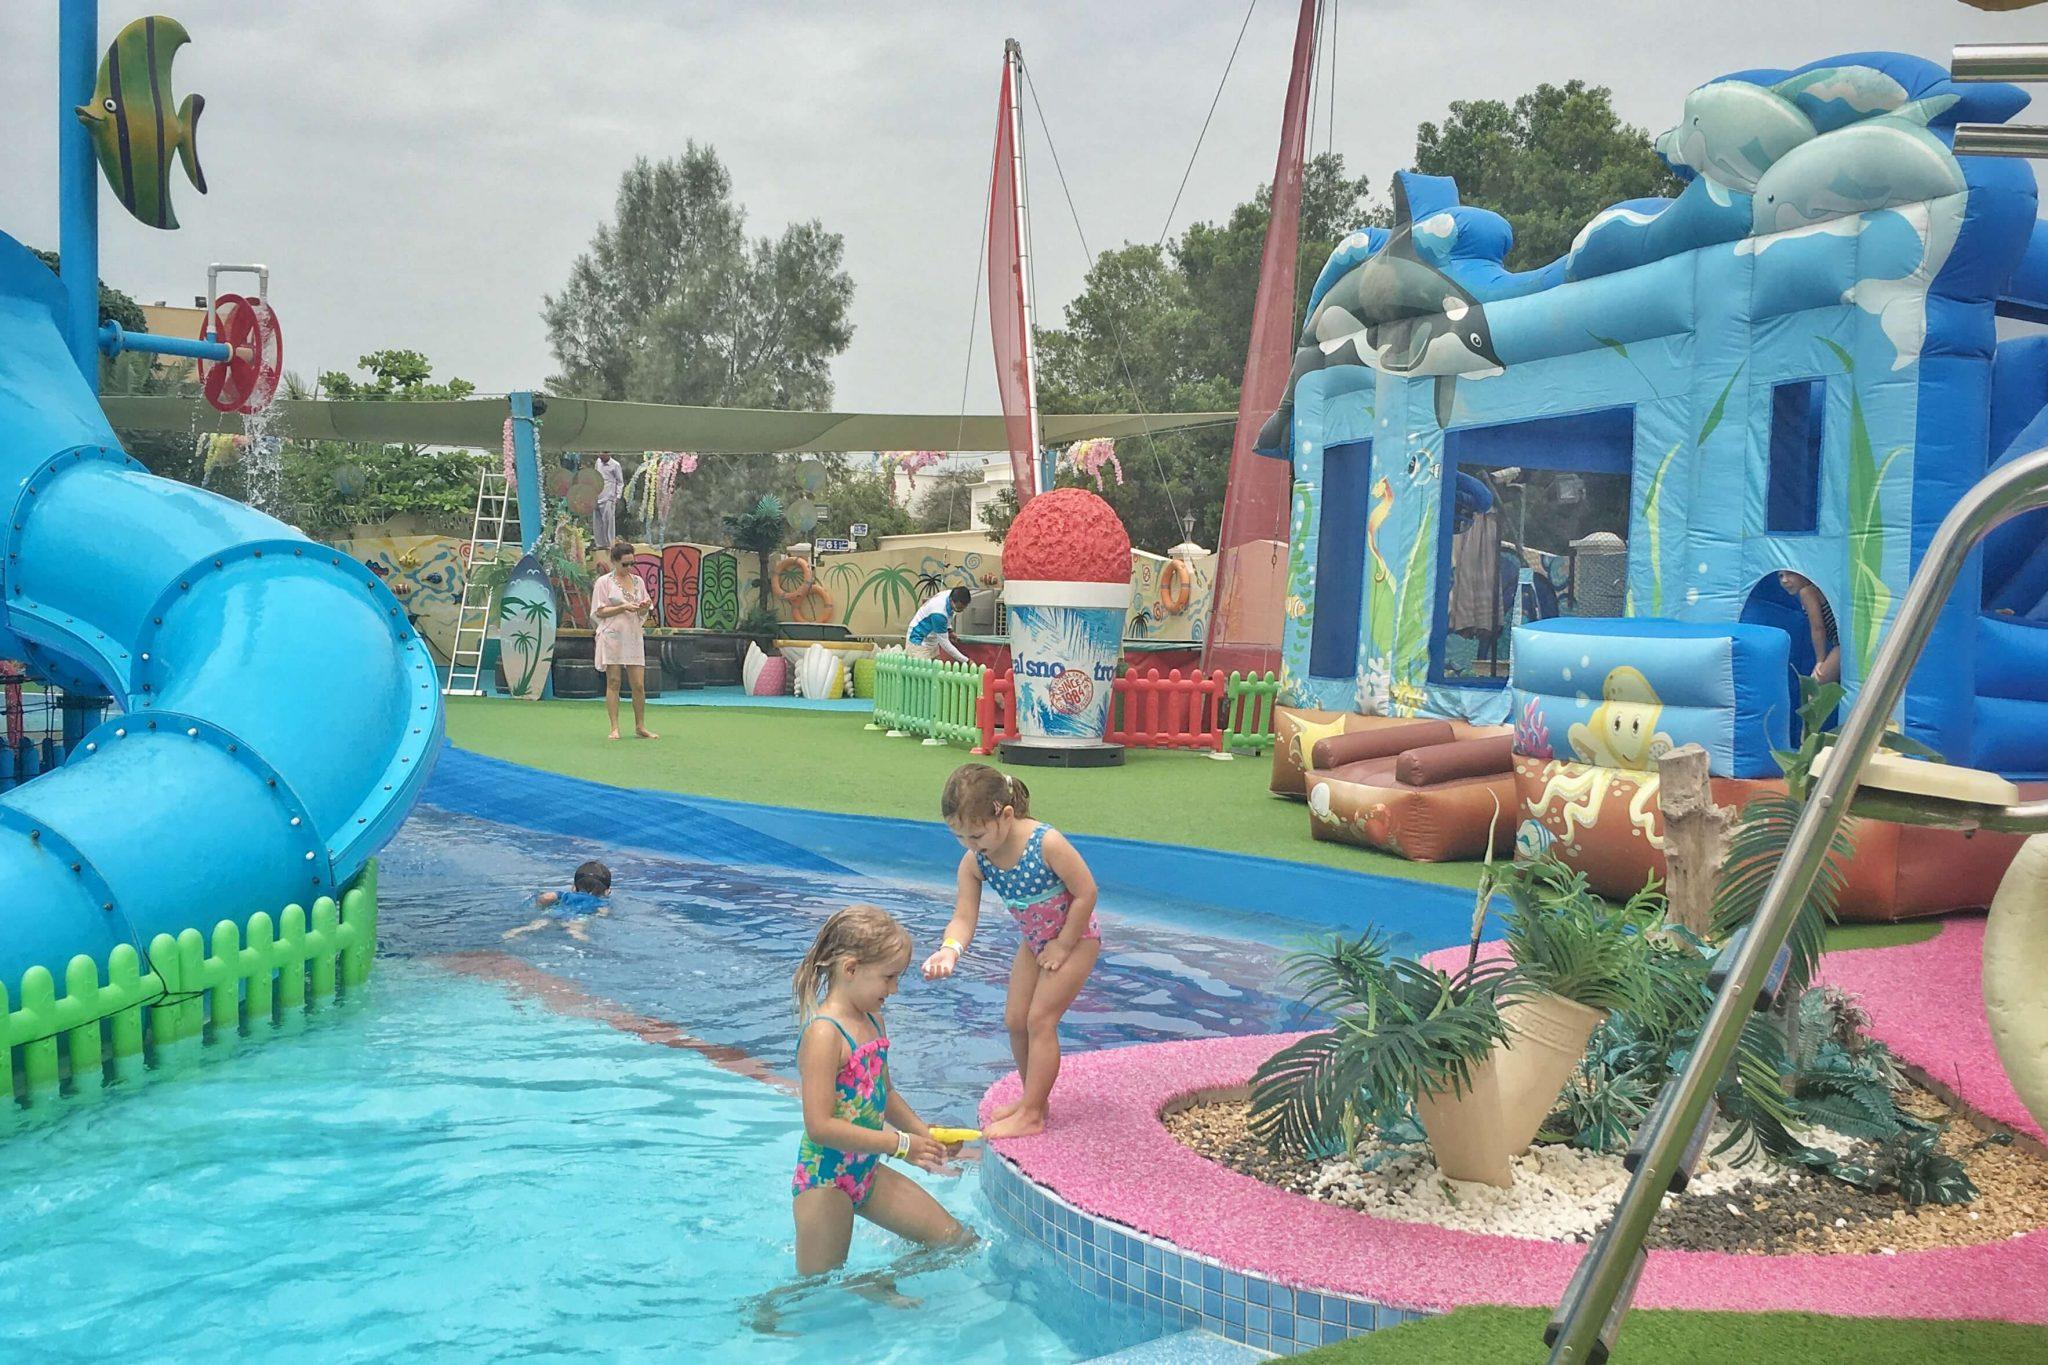 Waterpark Moreon: reviews, address, photos 84